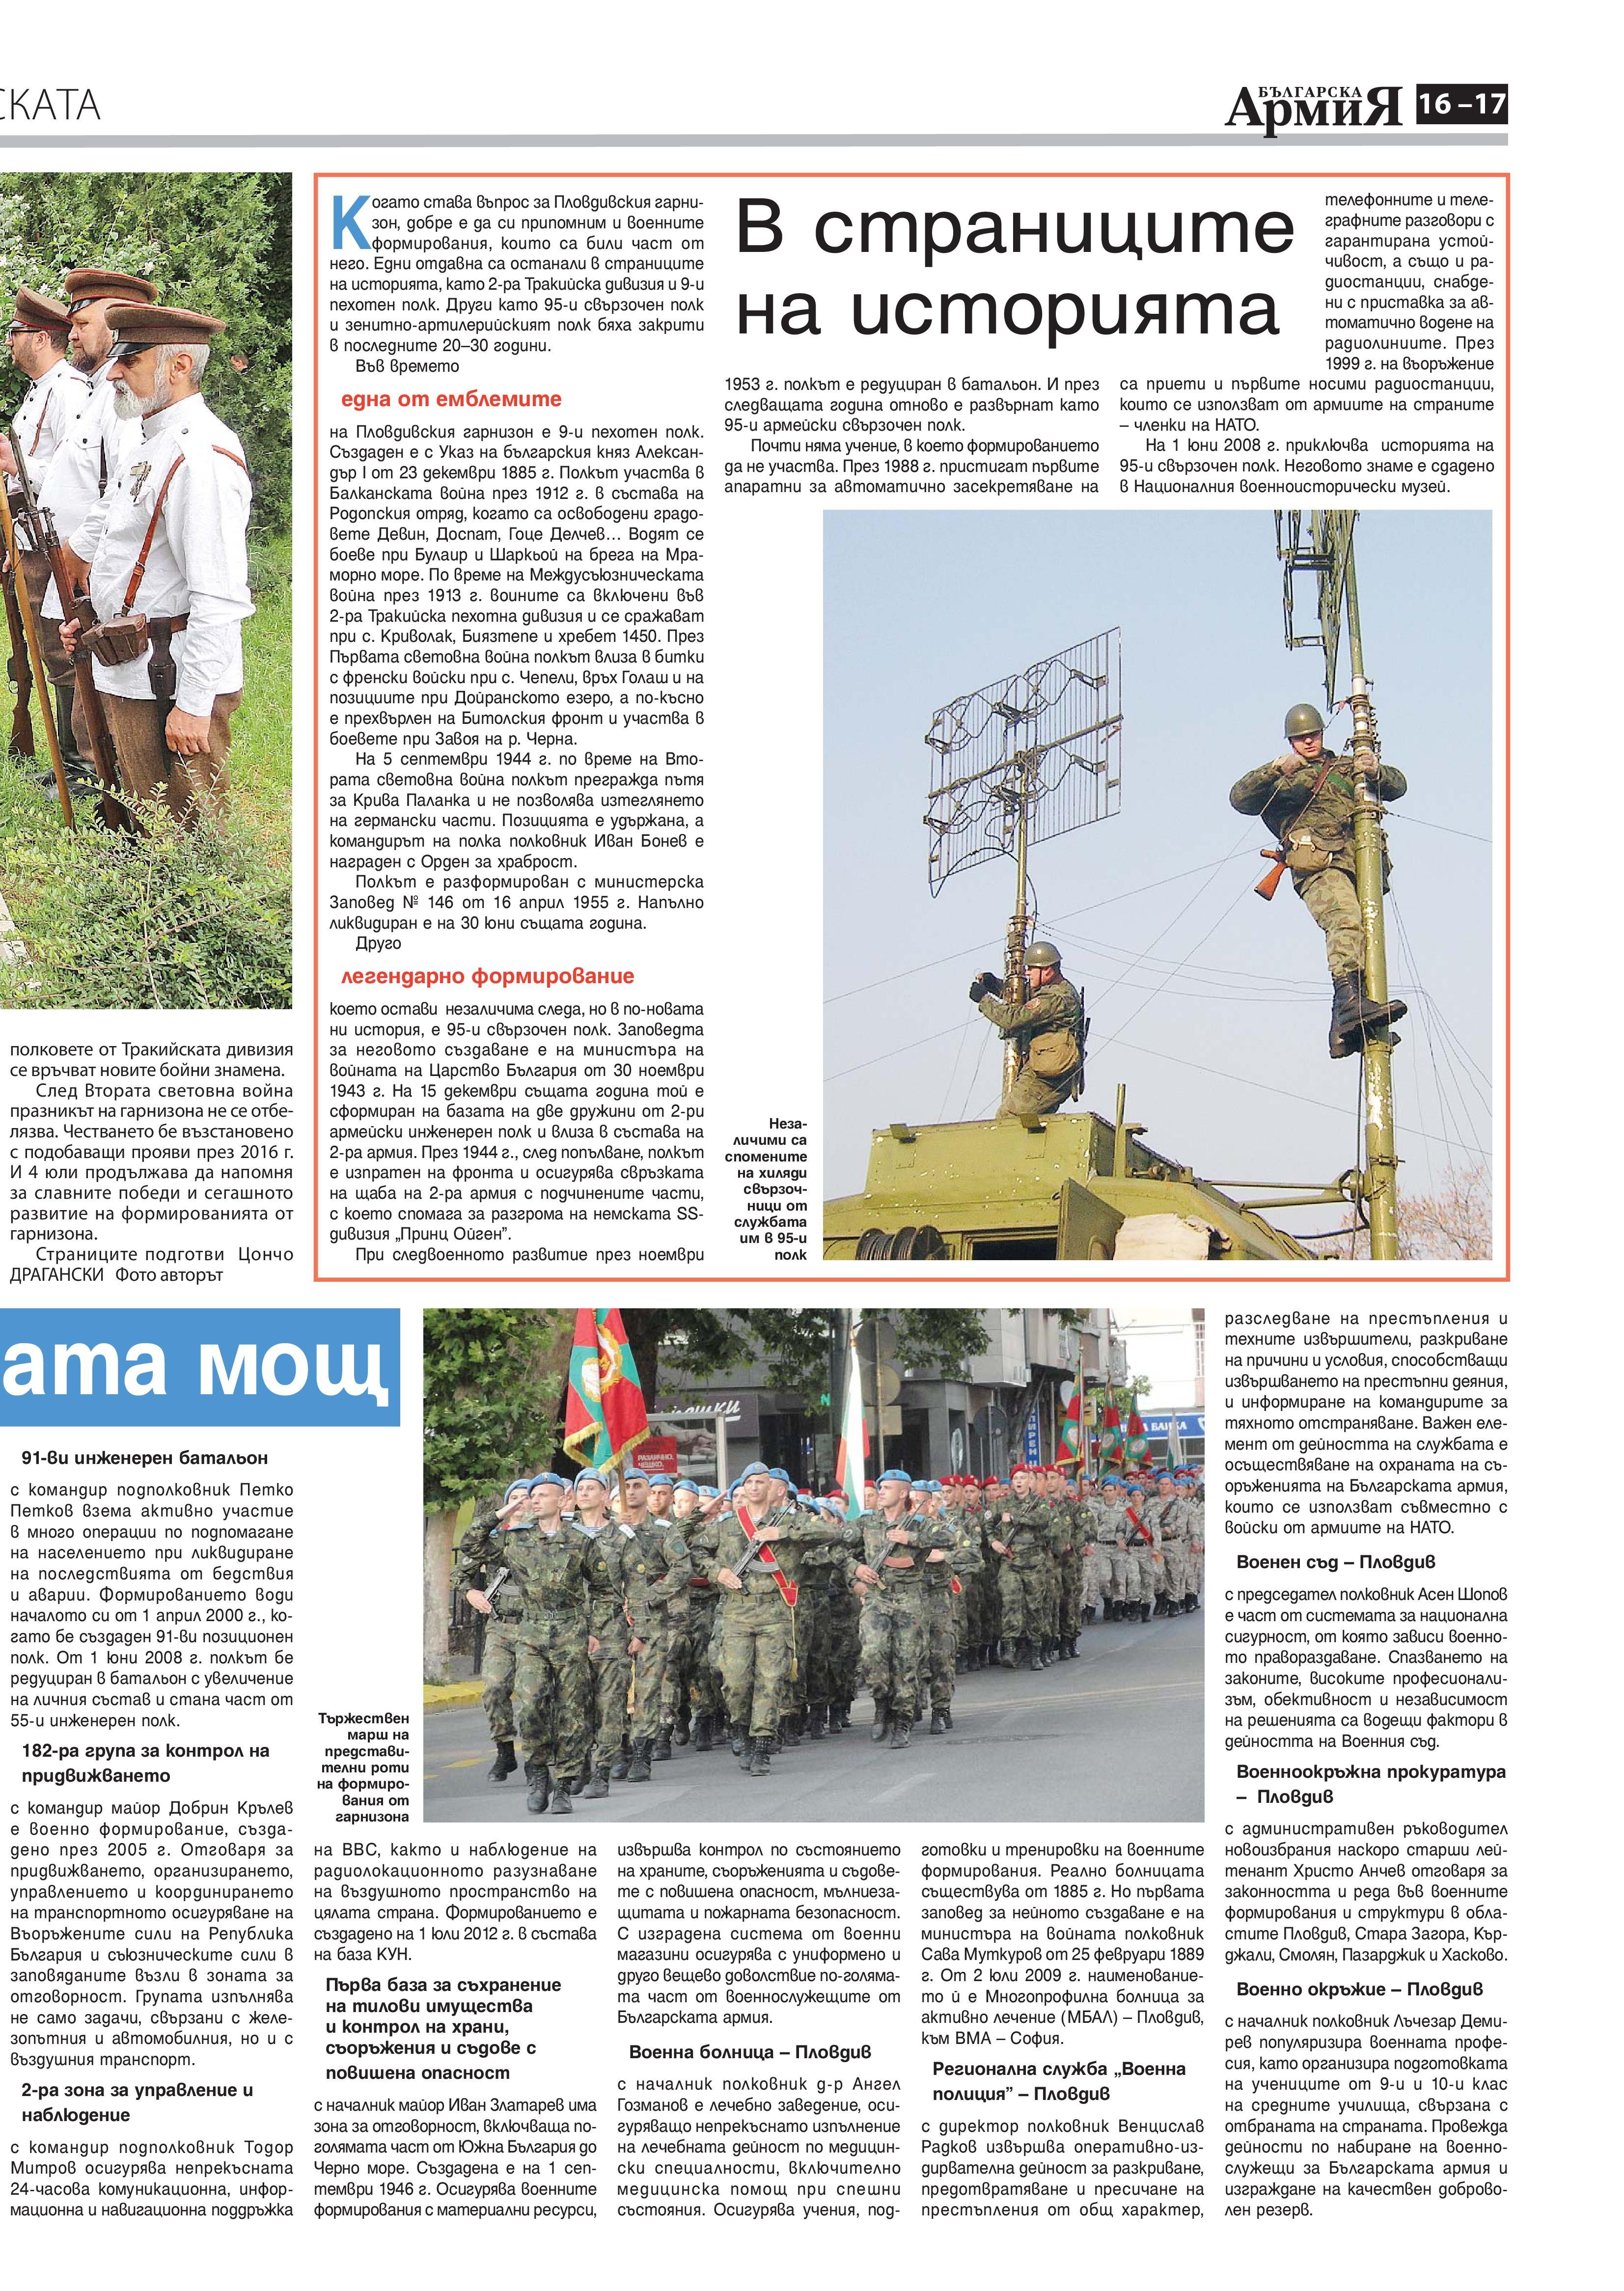 https://armymedia.bg/wp-content/uploads/2015/06/17-36.jpg